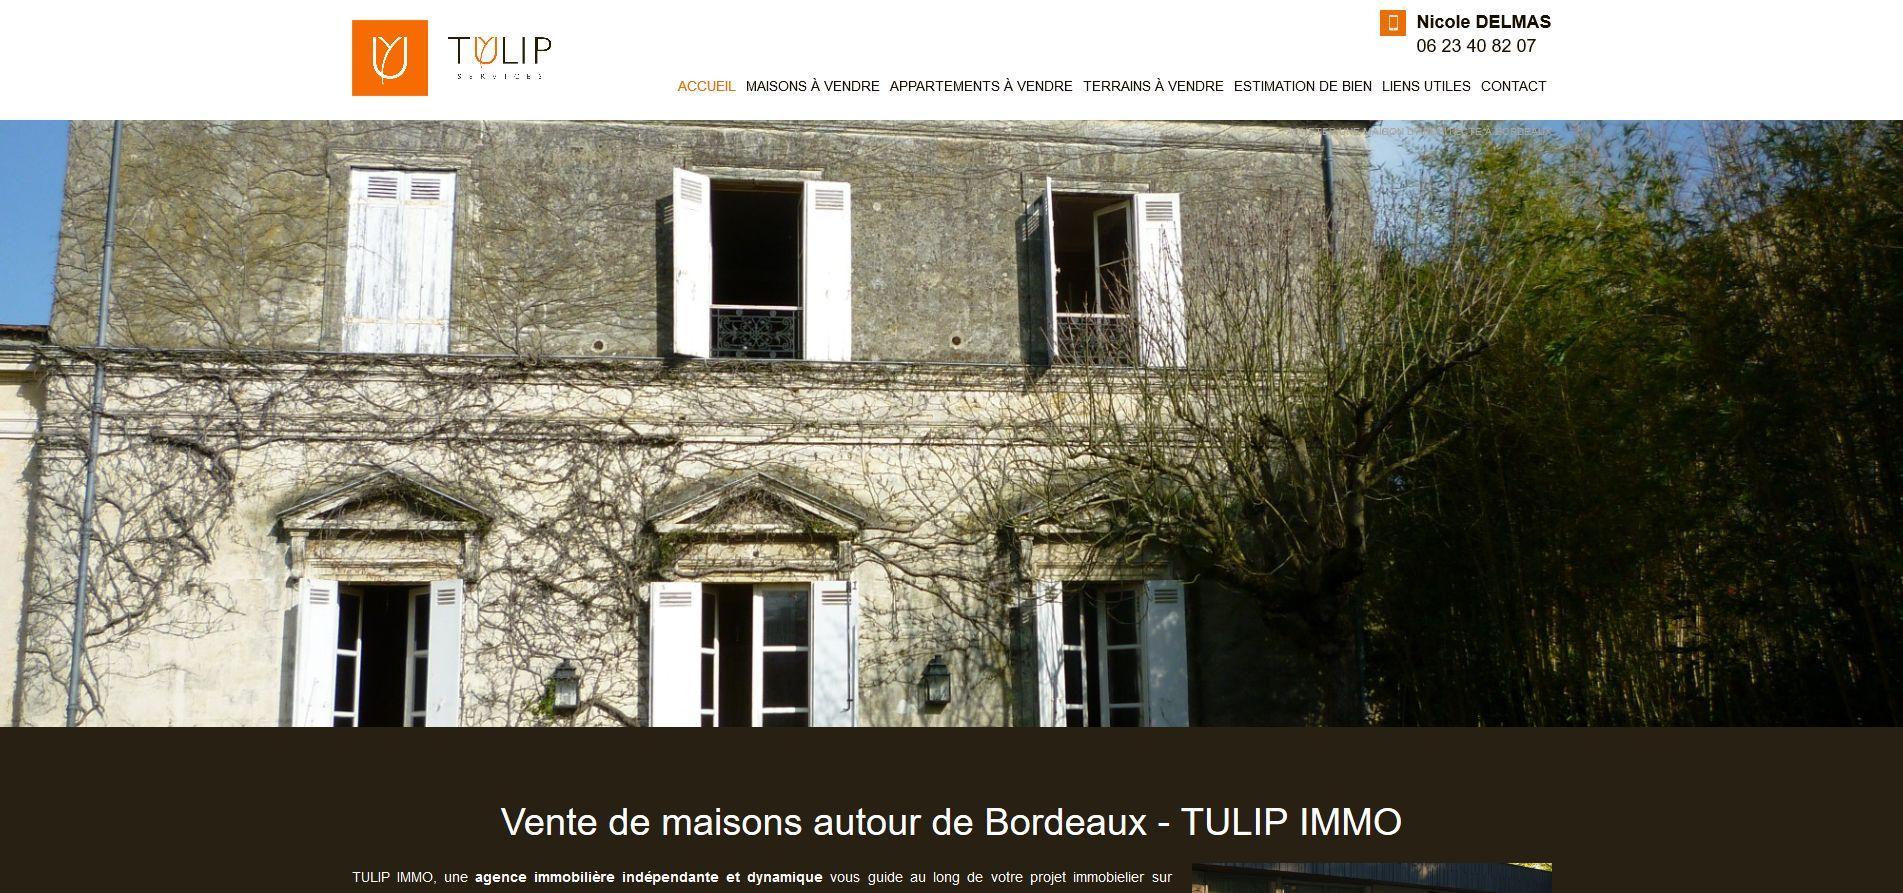 Agence immobili re bruges pour vente de maisons ou d for Agence de vente